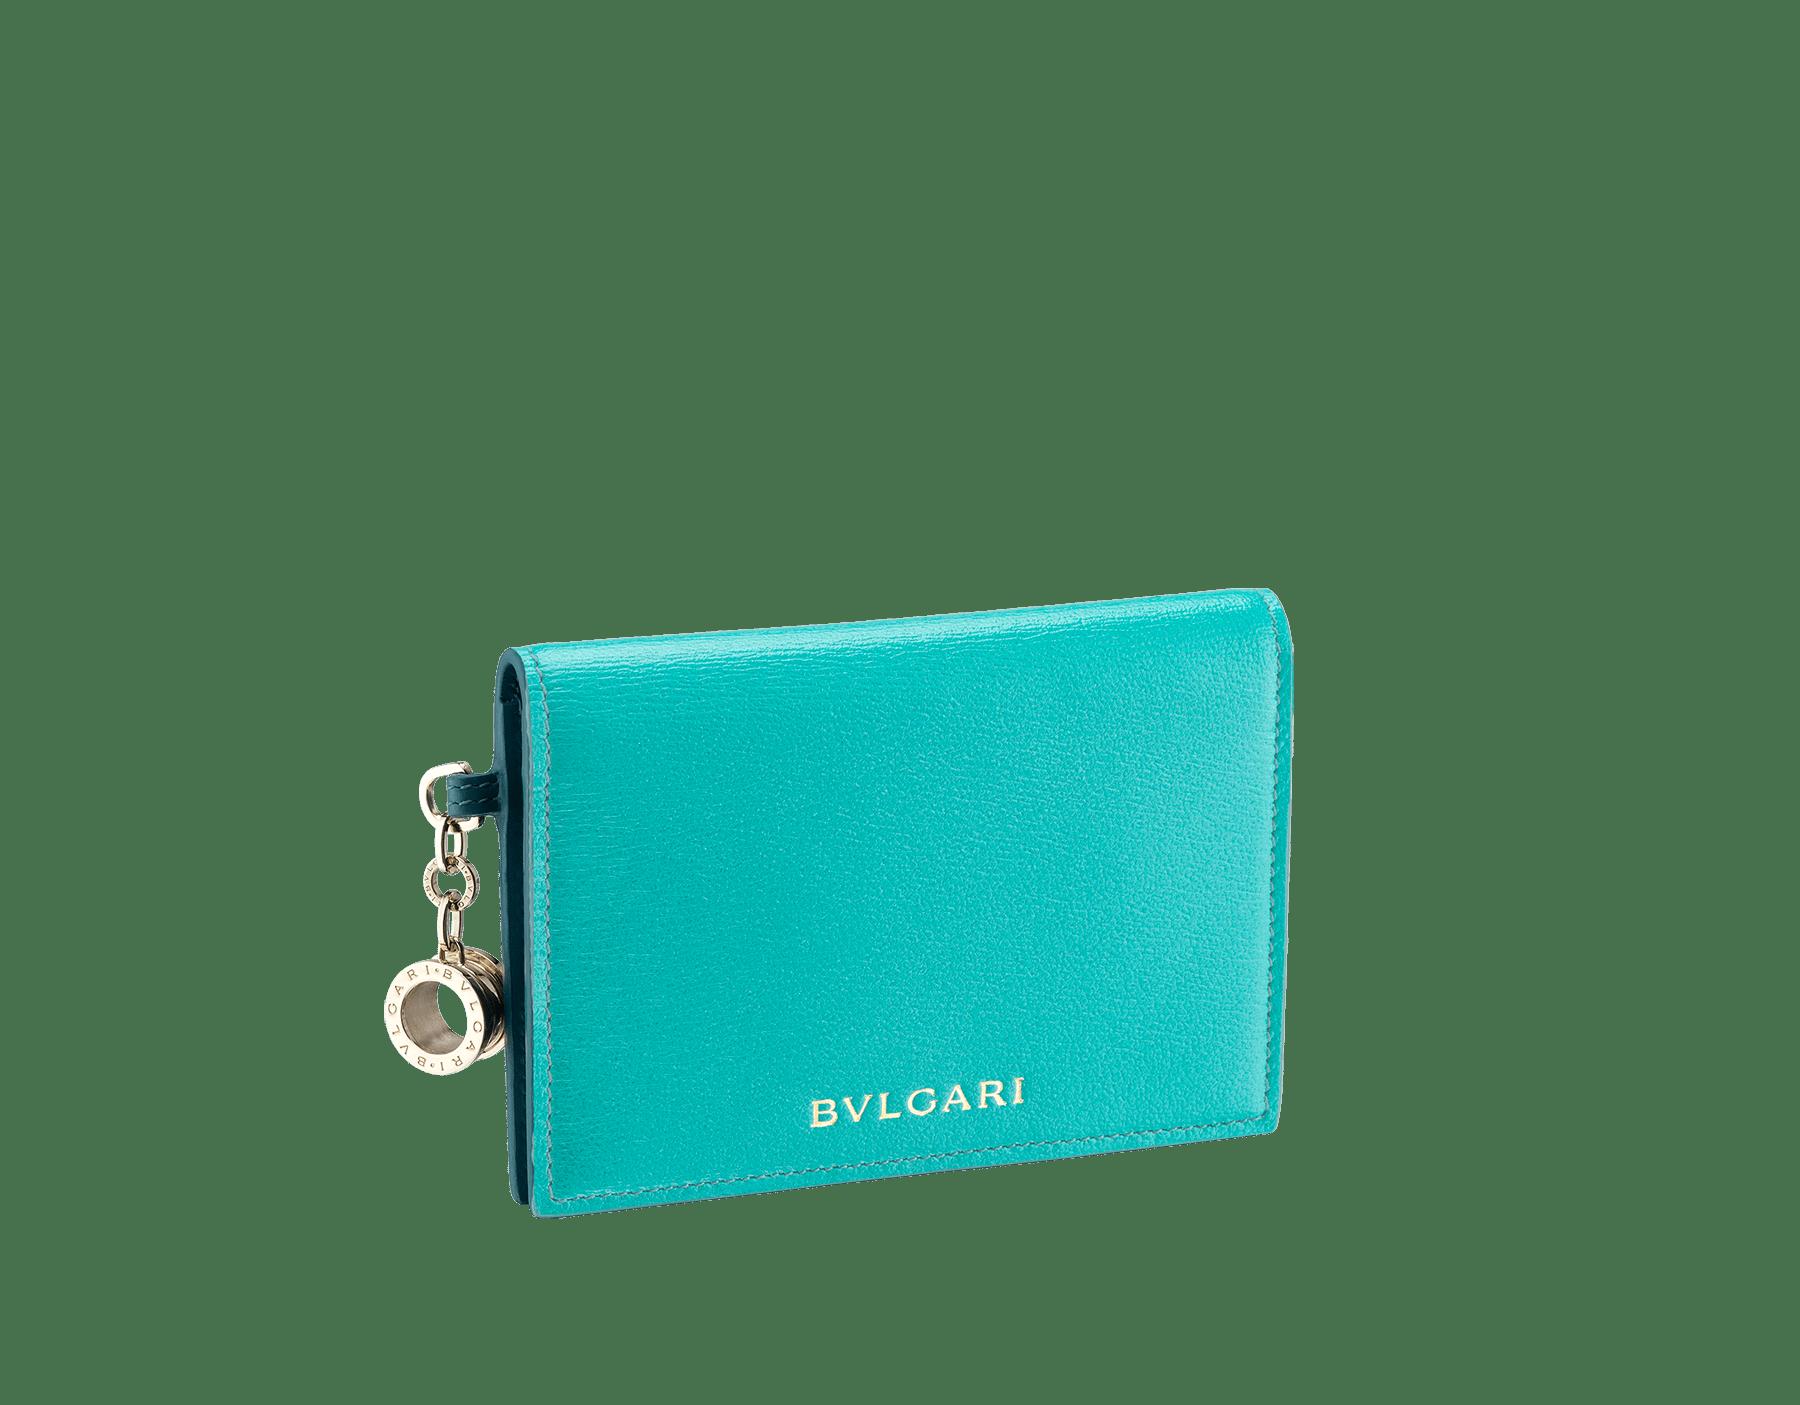 B.Zero1 熱帶綠松石色和深綠玉色羊皮折式信用卡夾。經典 B.Zero1 淡金色黃銅吊飾。 288238 image 1